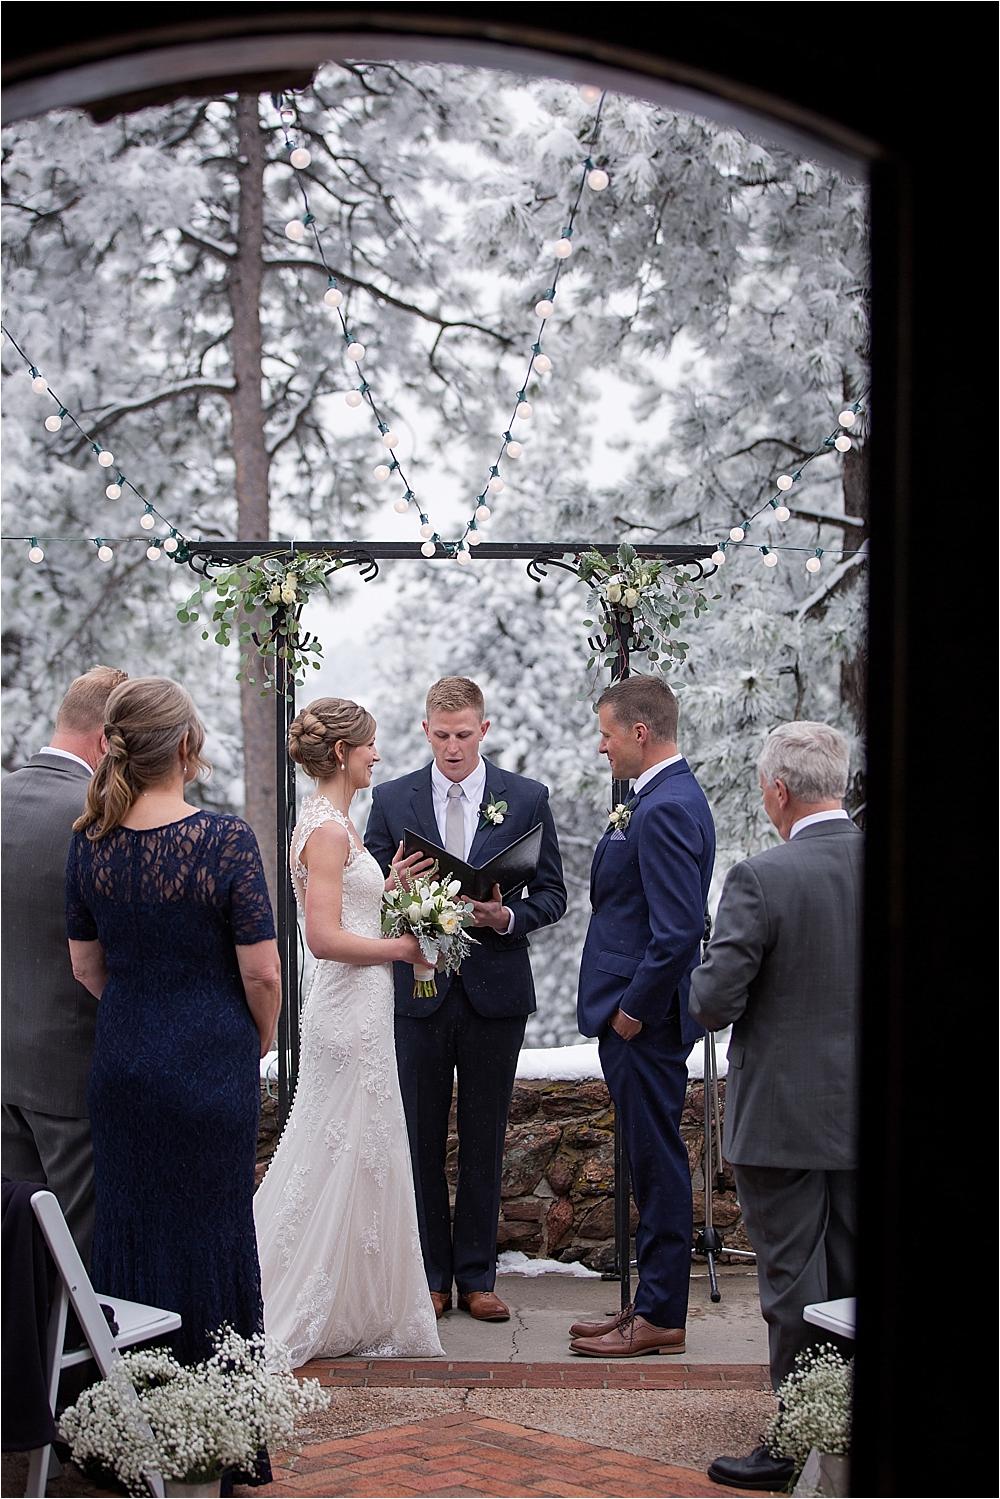 Amy + Colin's Boettcher Mansion Wedding_0067.jpg